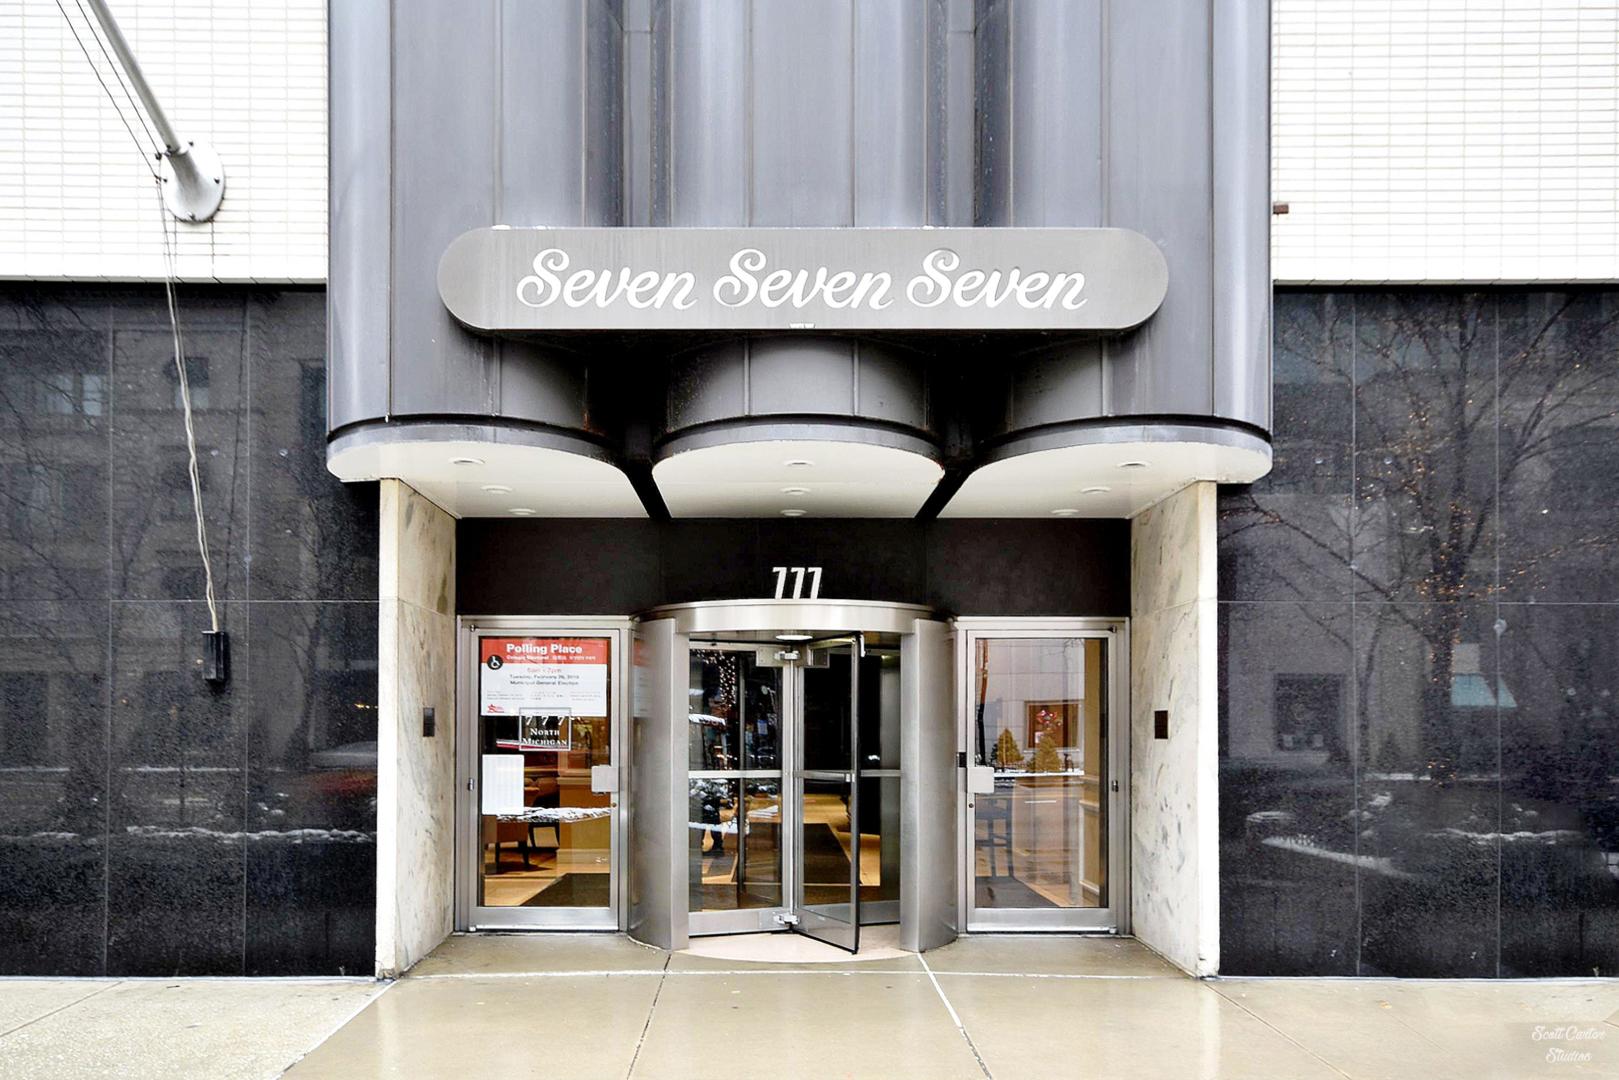 777 North Michigan Avenue, Chicago, Illinois 60611, 2 Bedrooms Bedrooms, ,2 BathroomsBathrooms,Condominium,For Sale,777 North Michigan Avenue,11035128